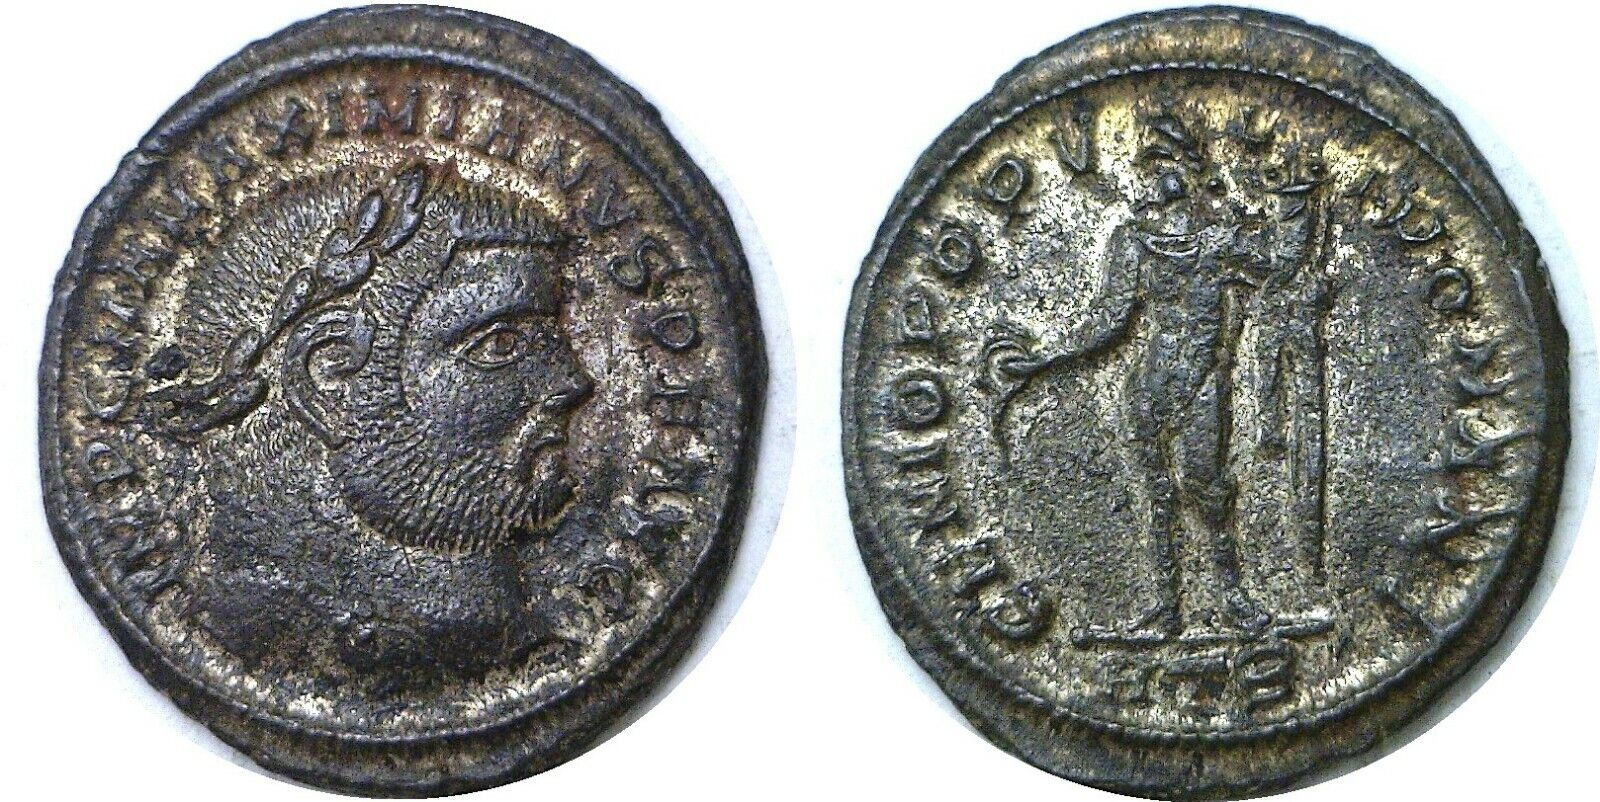 286-305 AD Roman Maximianus Genius Heraclea Large Silvered Follis 10.54 Grams